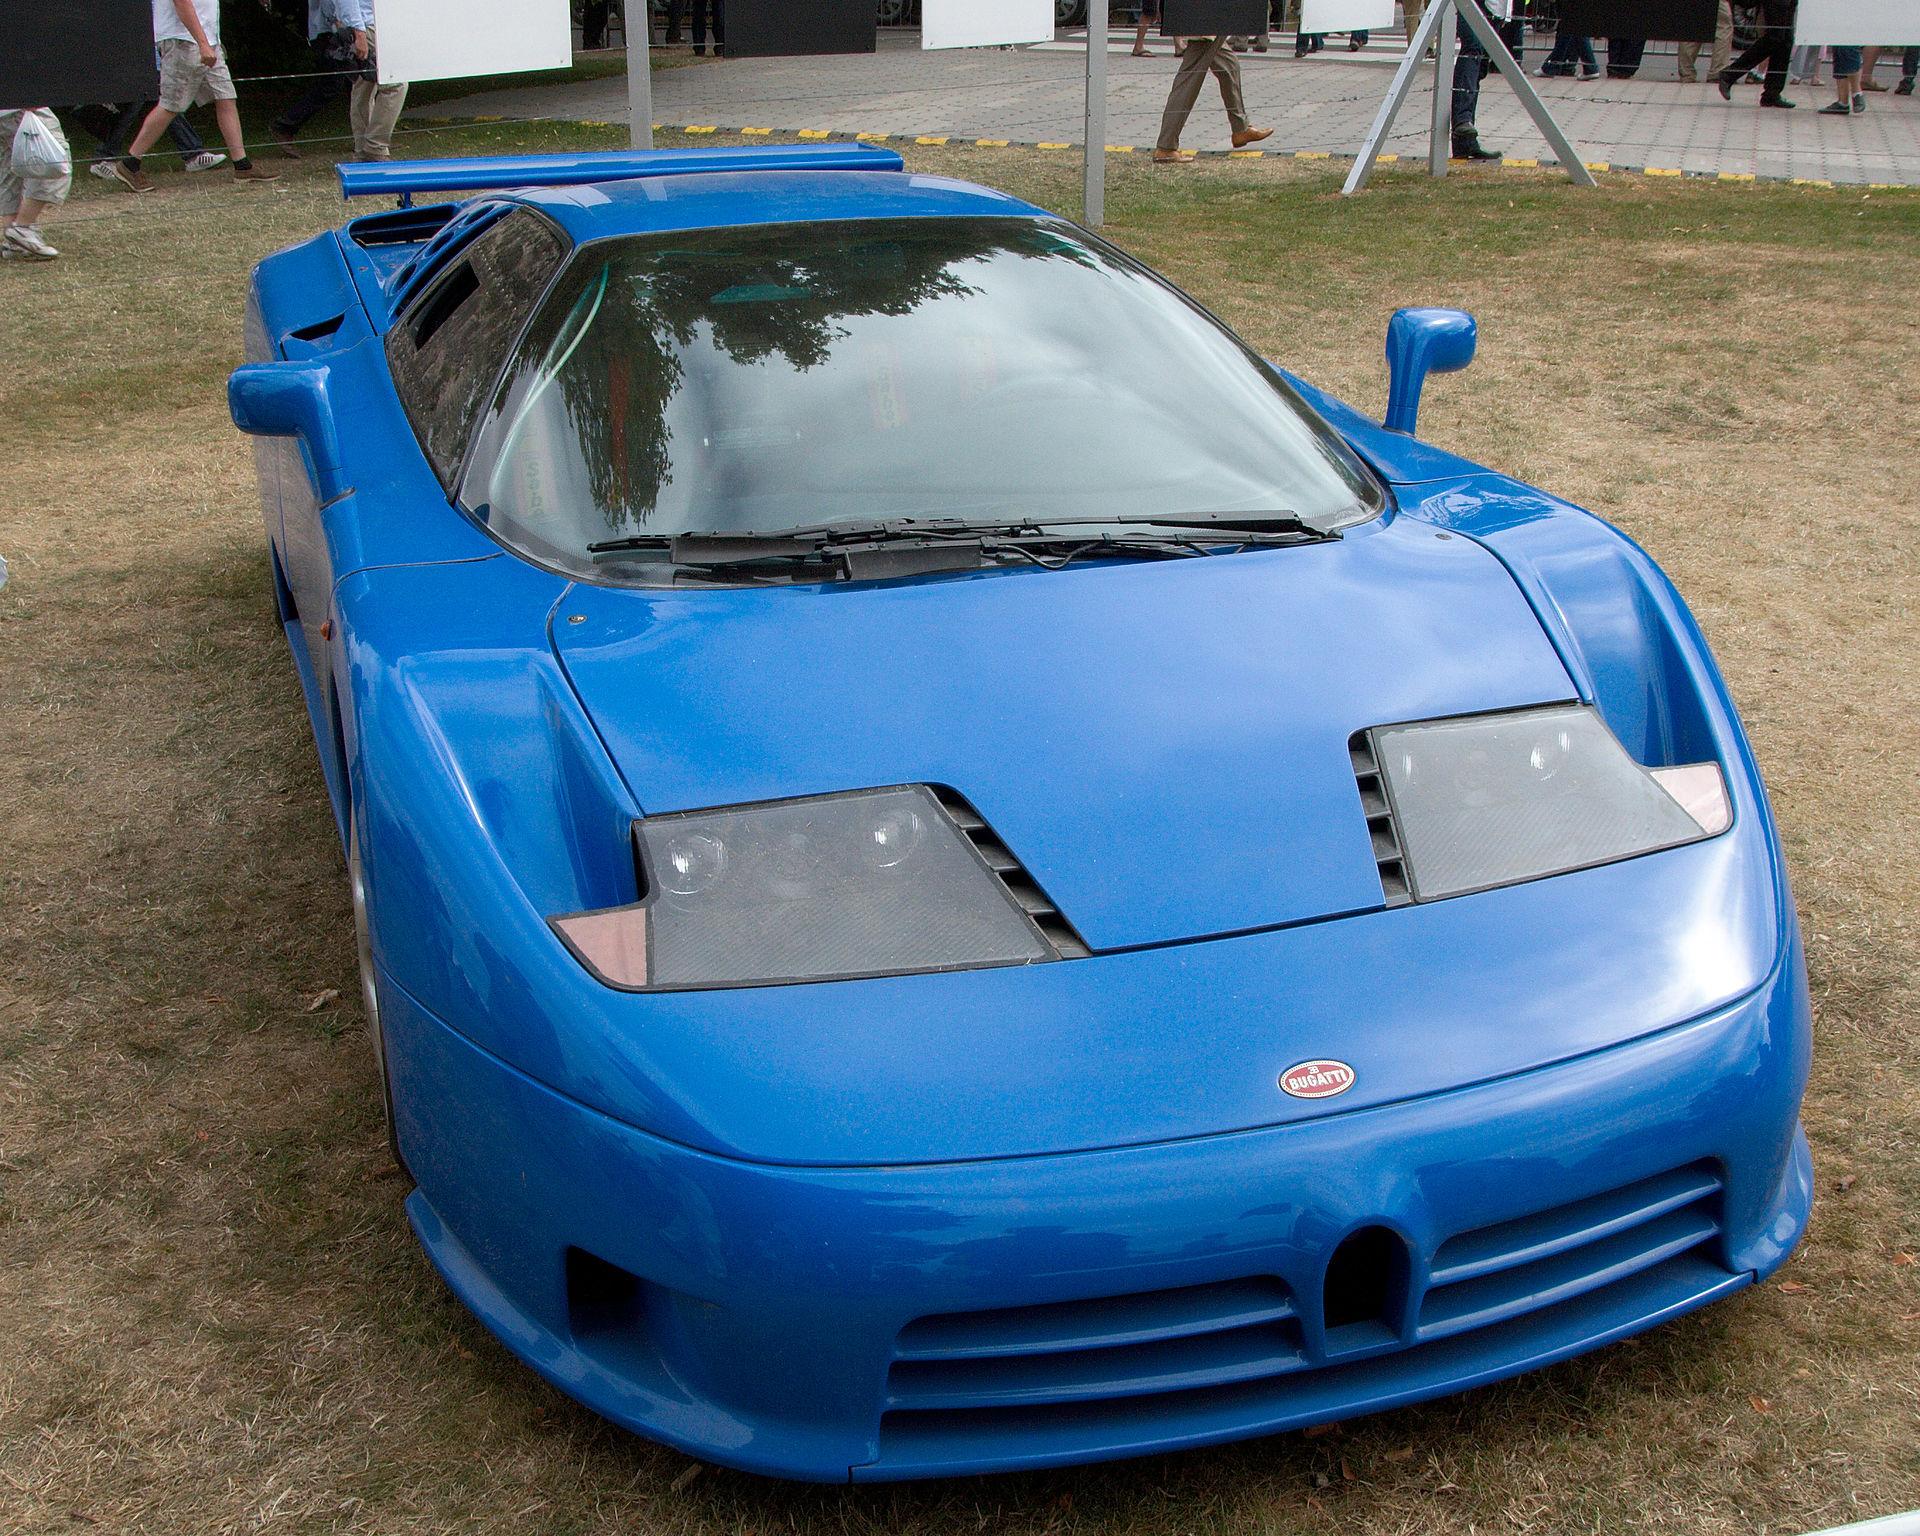 Bugatti Eb110 Wikipedia Wolna Encyklopedia HD Wallpapers Download free images and photos [musssic.tk]